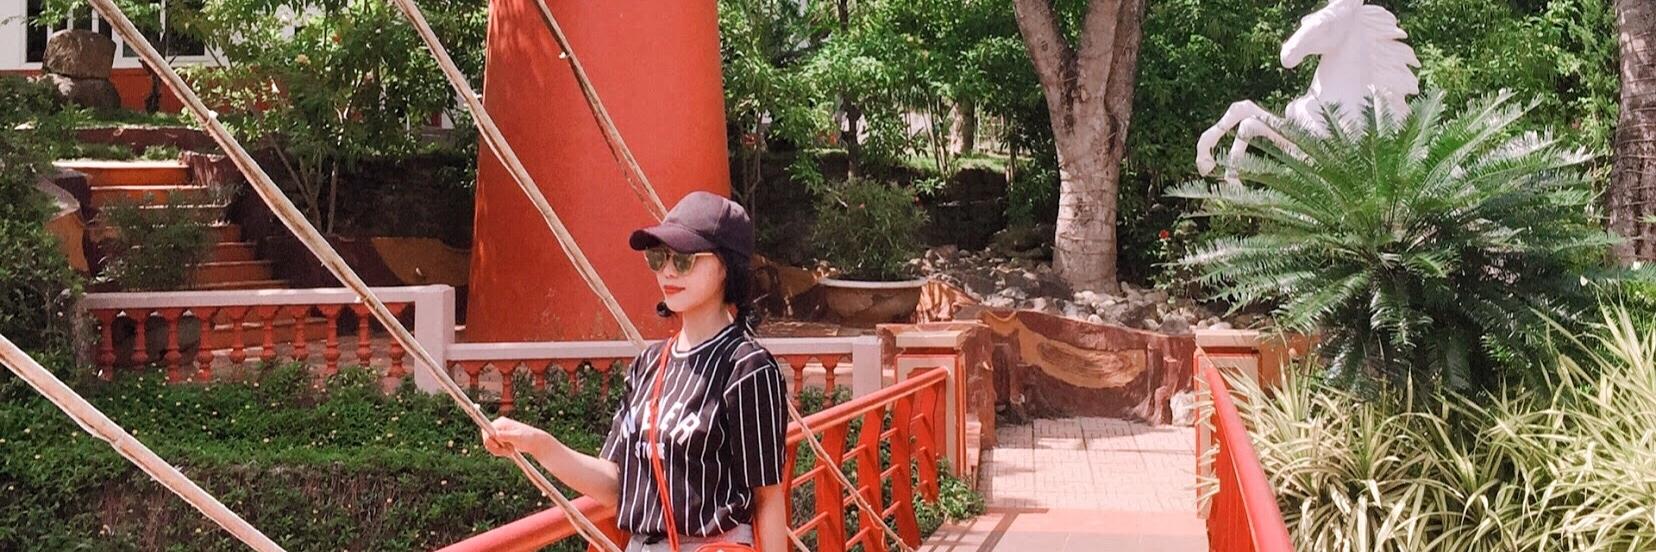 https://gody.vn/blog/yumi.uyenthuong06063858/post/8-van-4-ngan-6-tram-diem-du-lich-tai-tp-buon-ma-thuot-thu-phu-ca-phe-tinh-daklak-5212